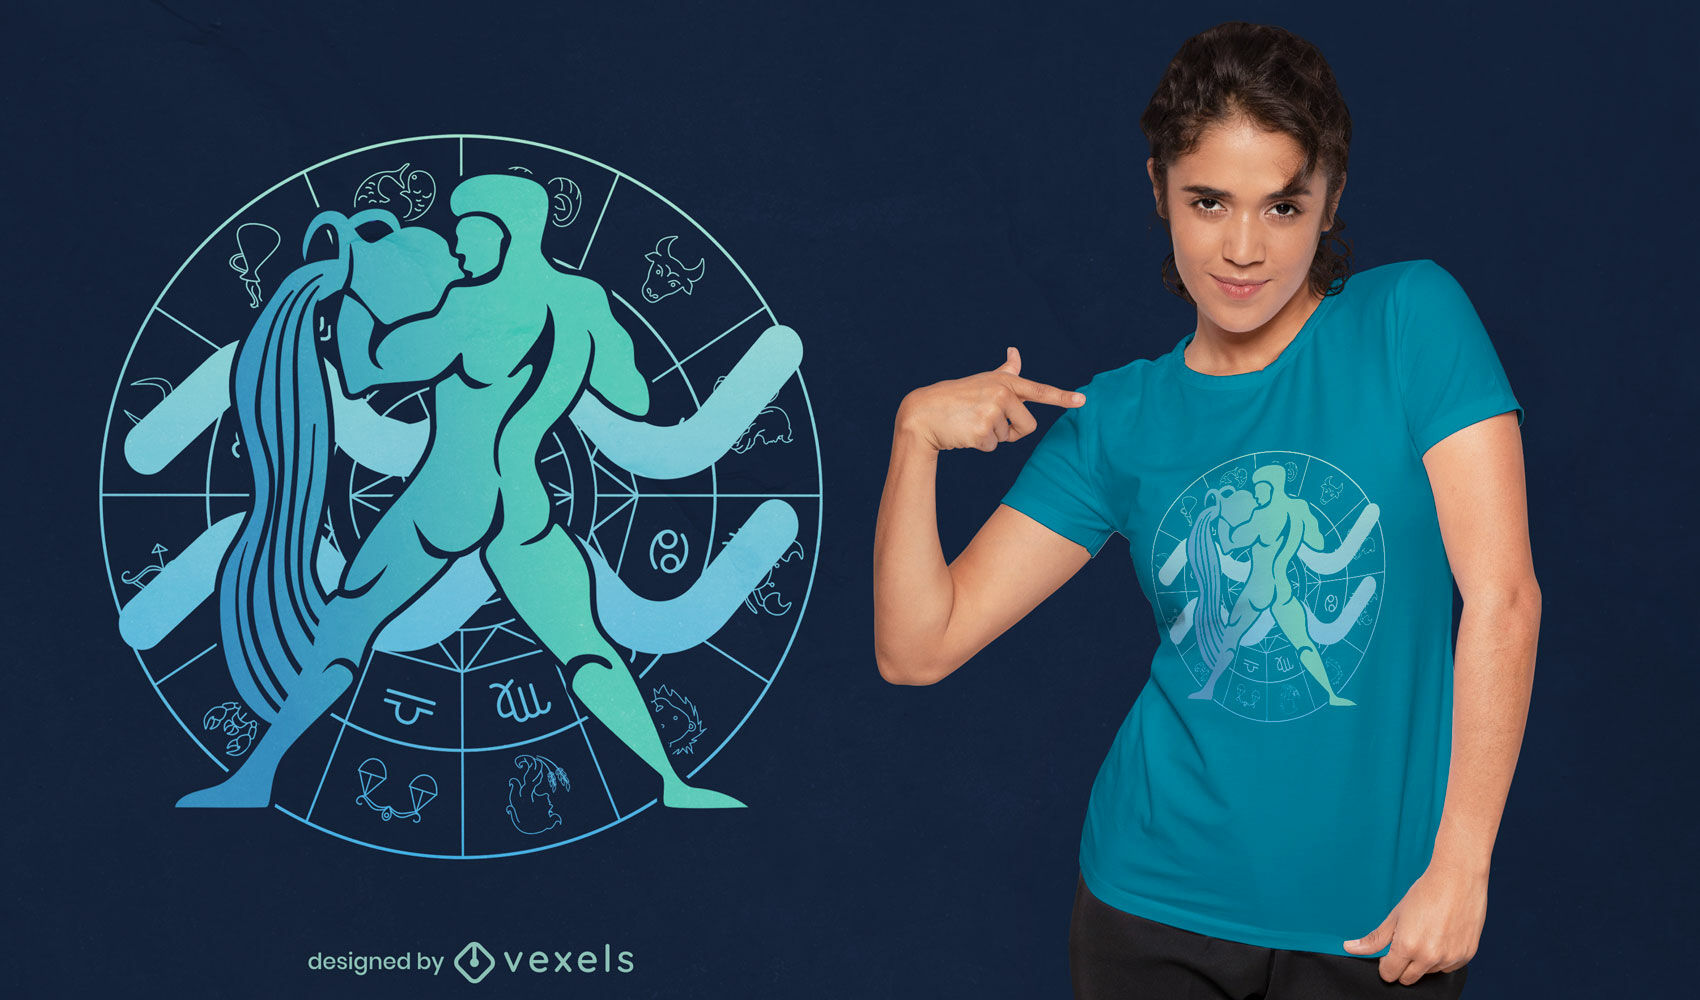 Aquarius zodiac sign t-shirt design